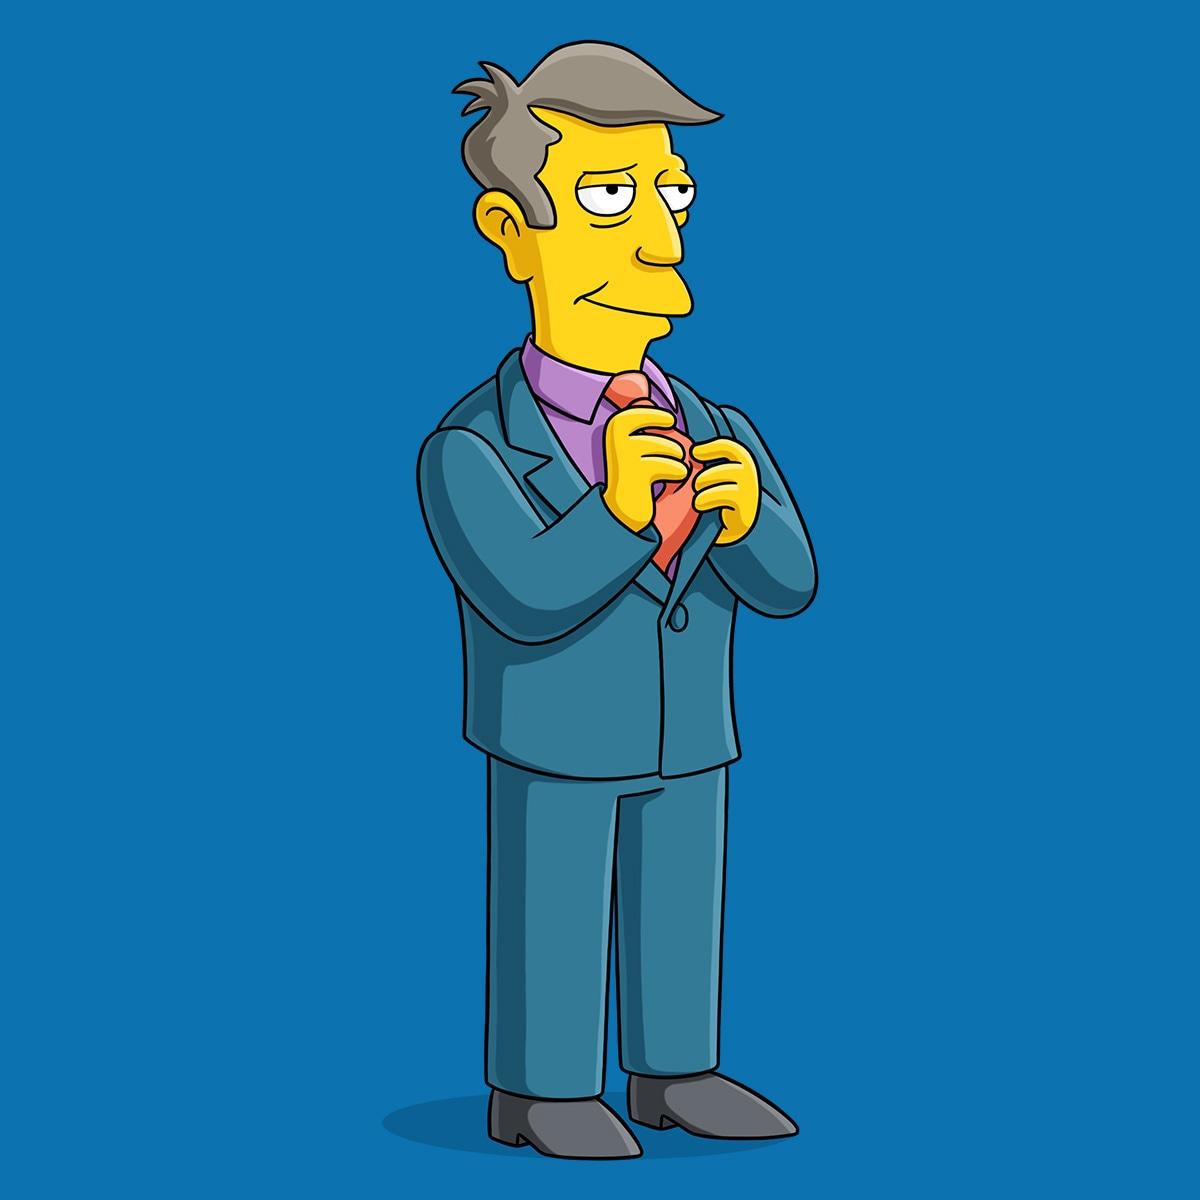 Principal Skinner   Simpsons World on FXX